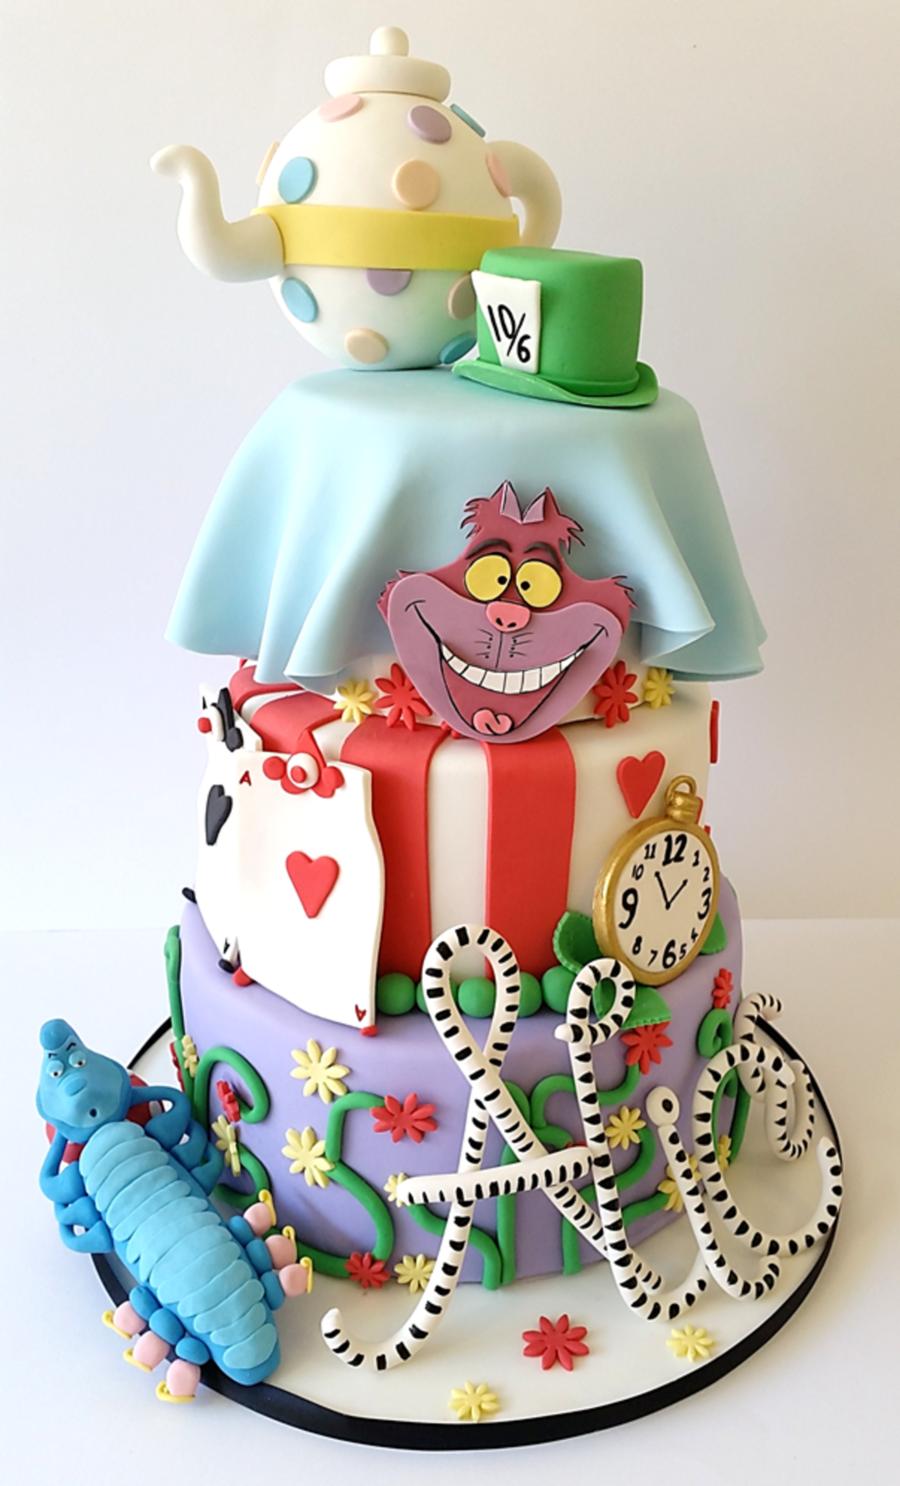 Alice In Wonderland Birthday Cake Decorations